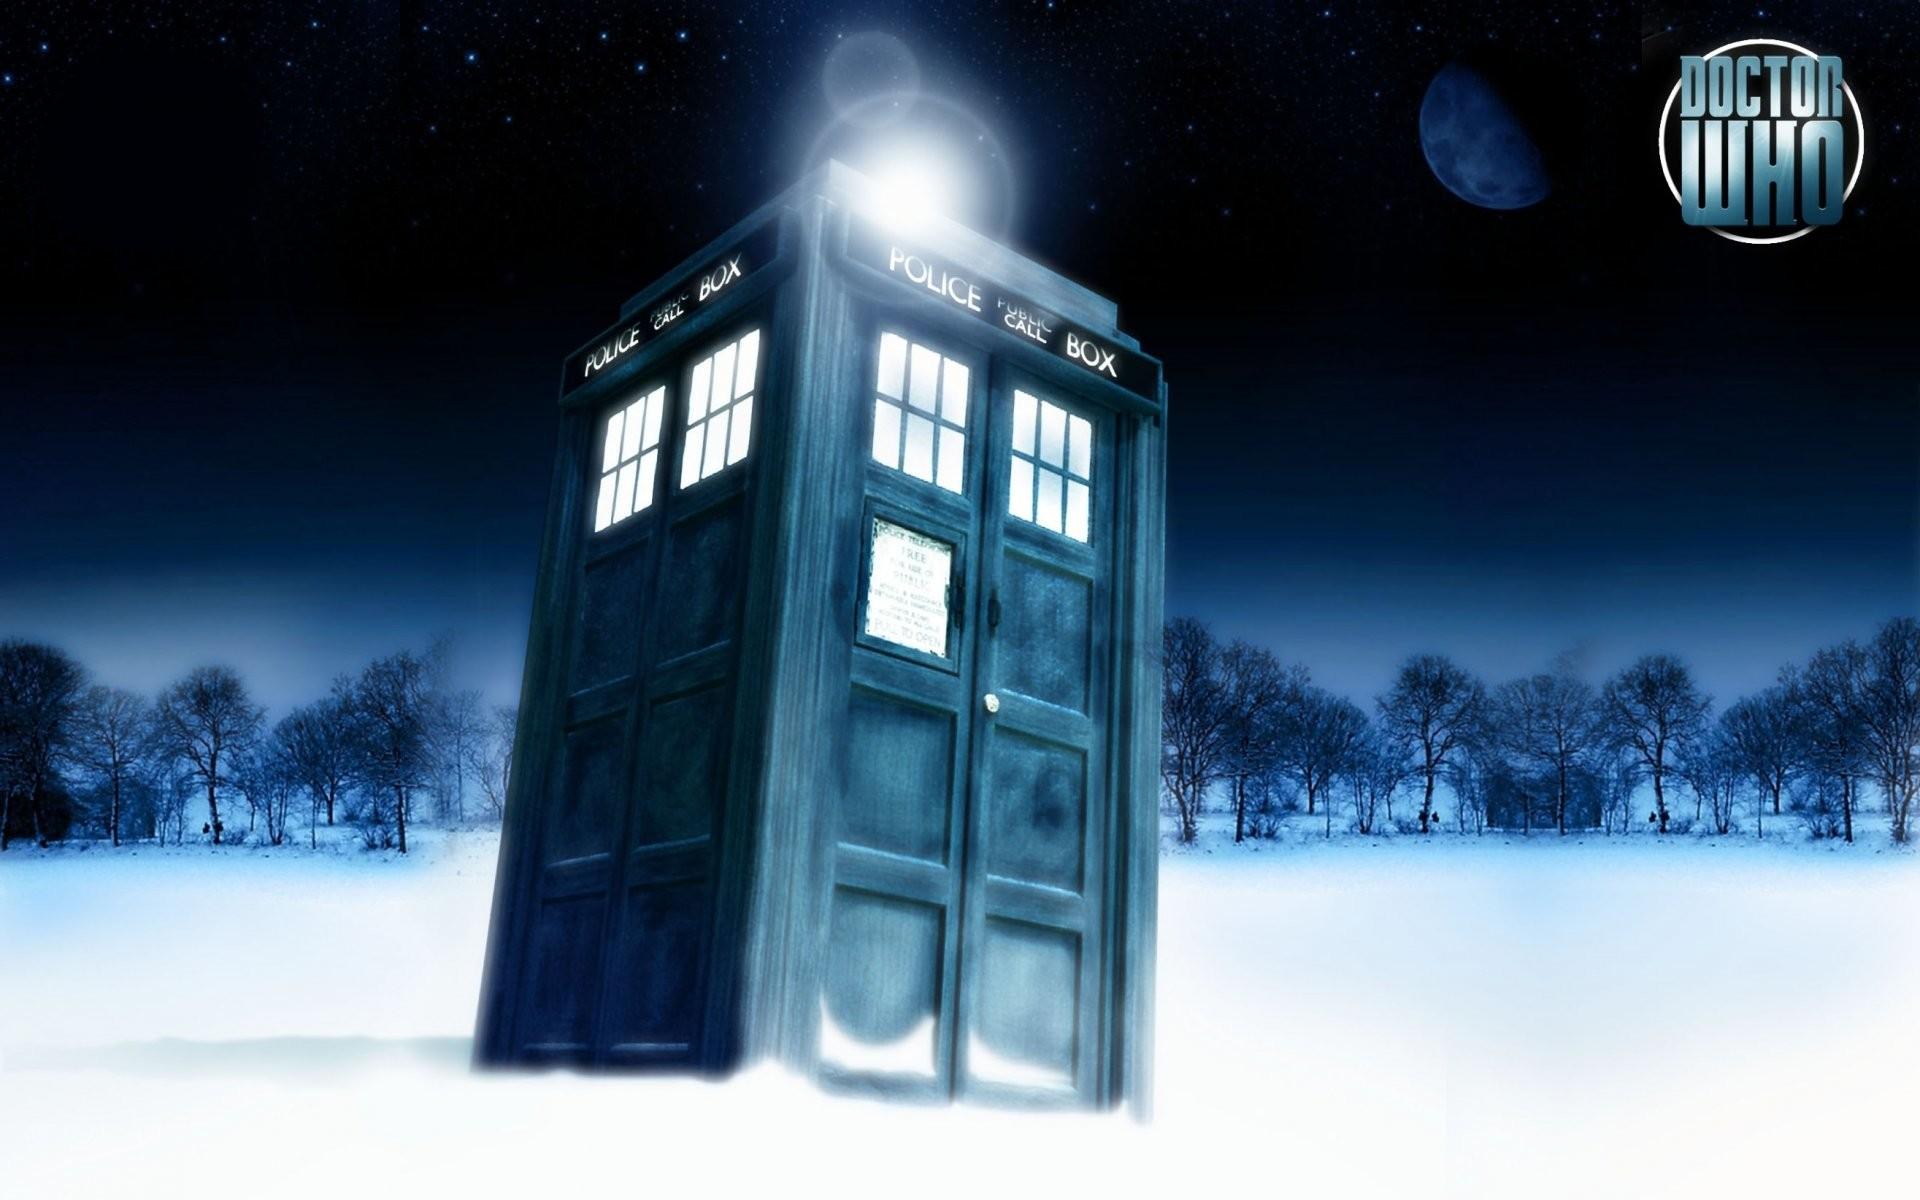 Doctor who wallpaper tardis all doctors wallpapertag - Tardis wallpaper ...